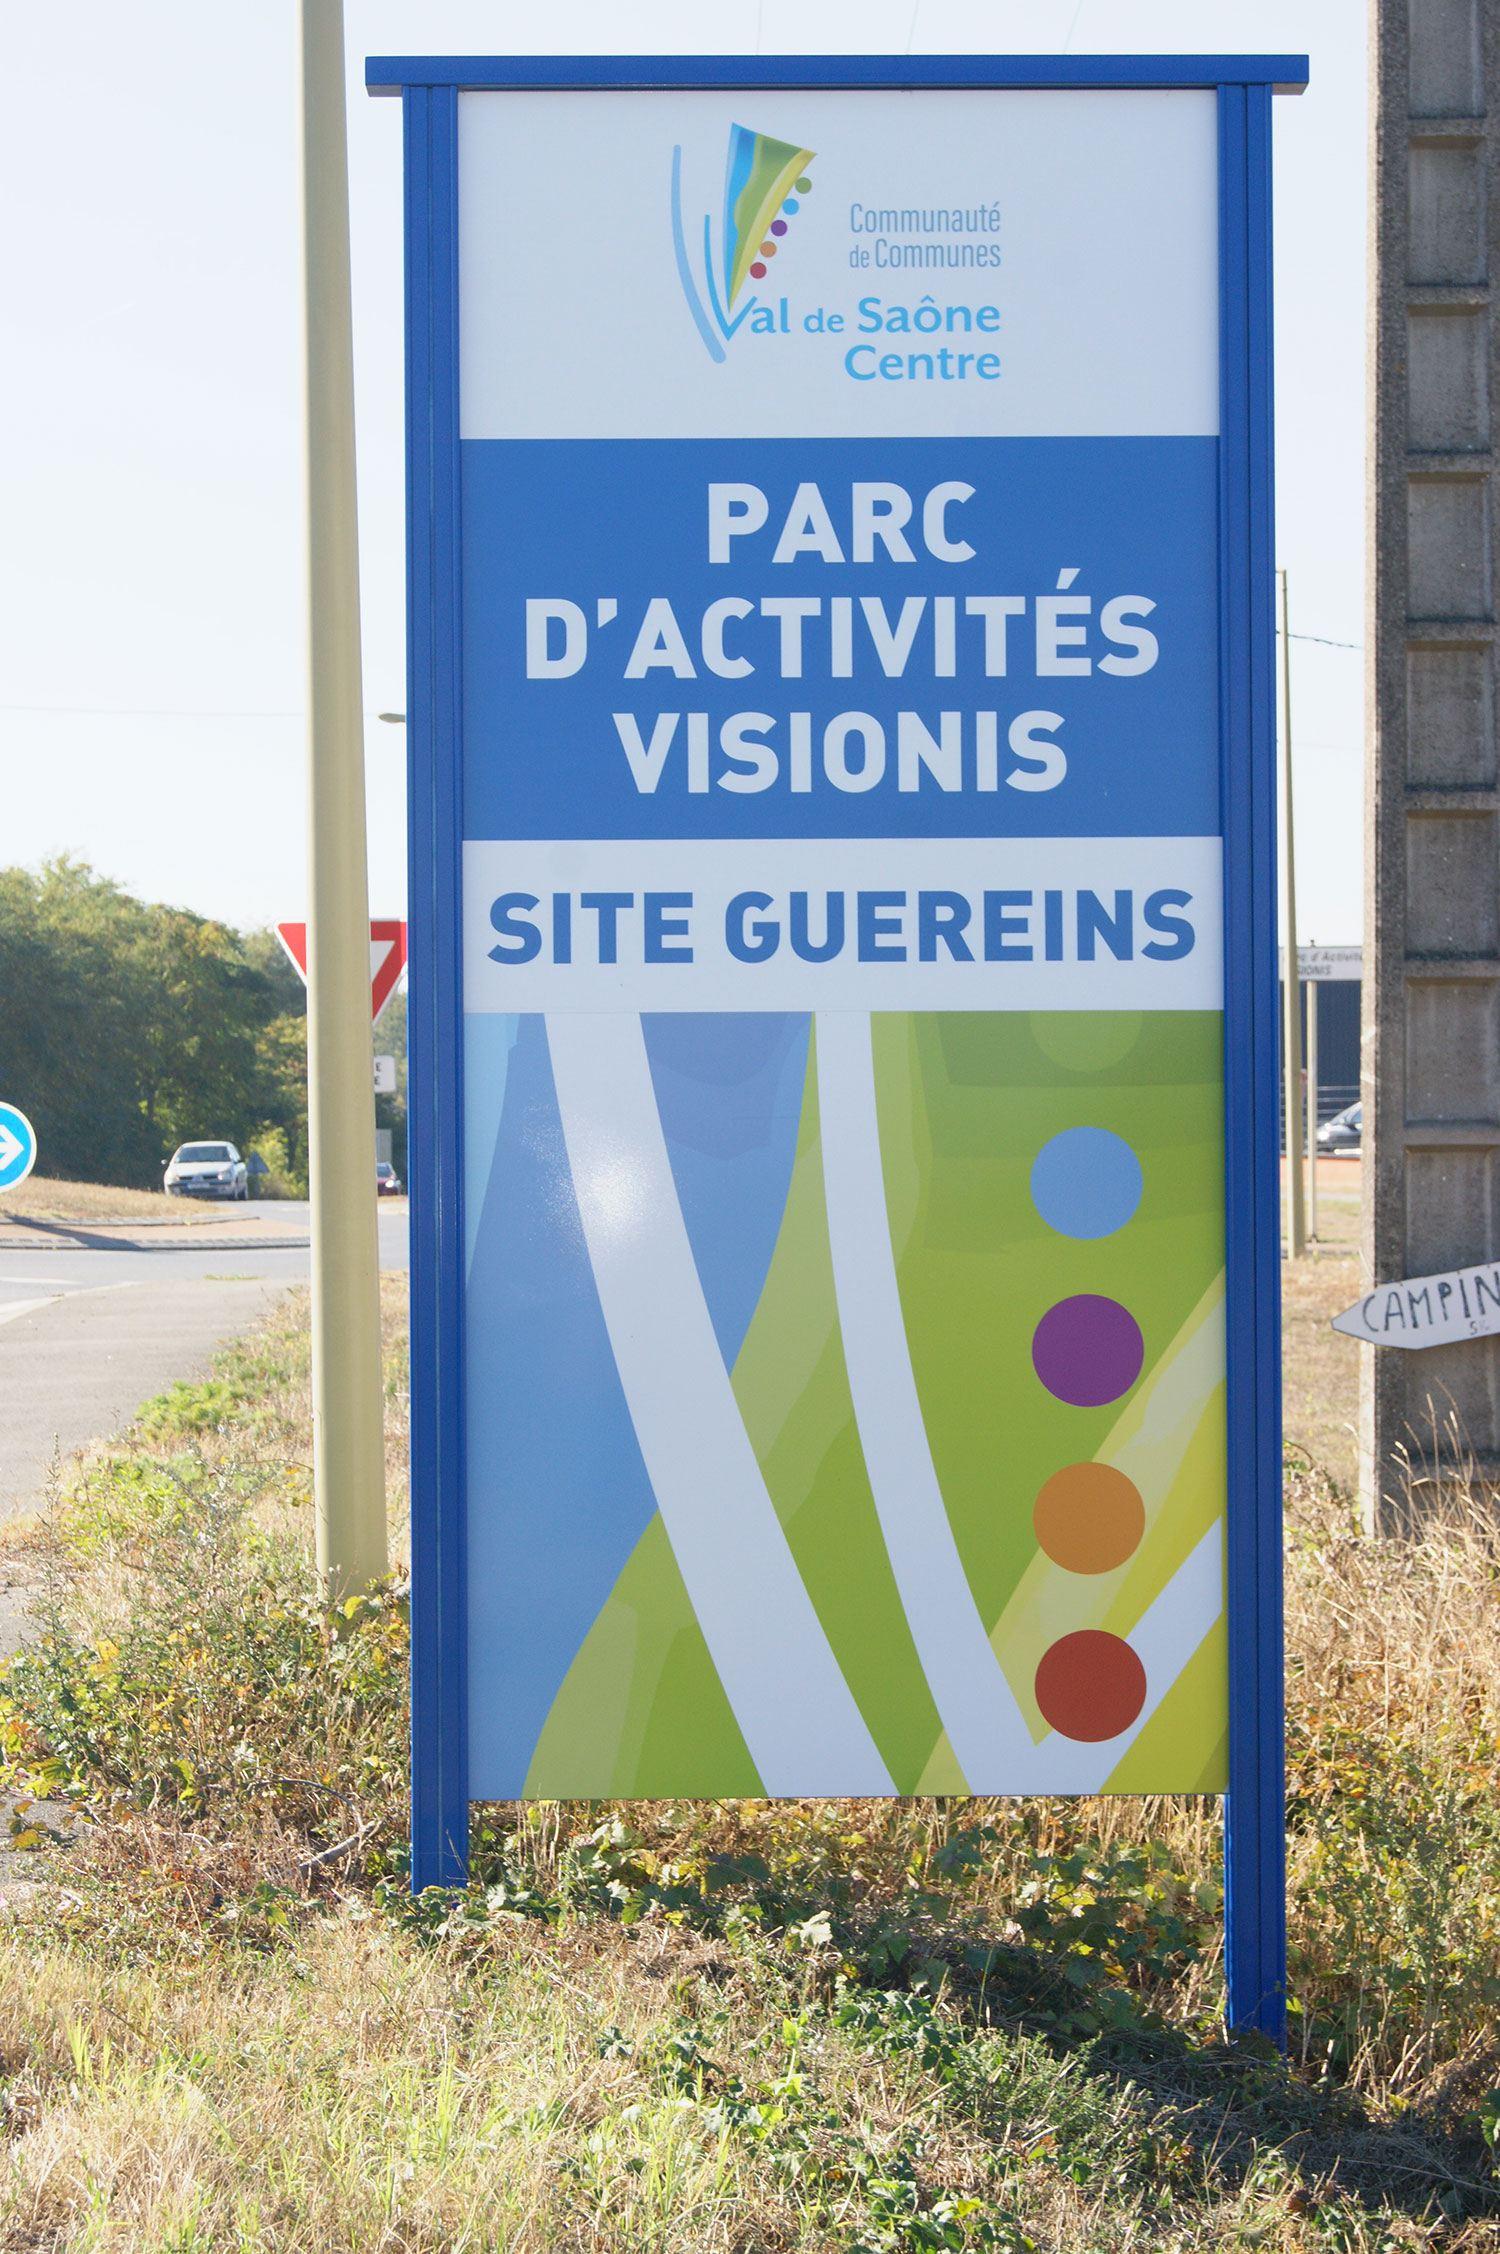 Visionis-site-guéreins-9